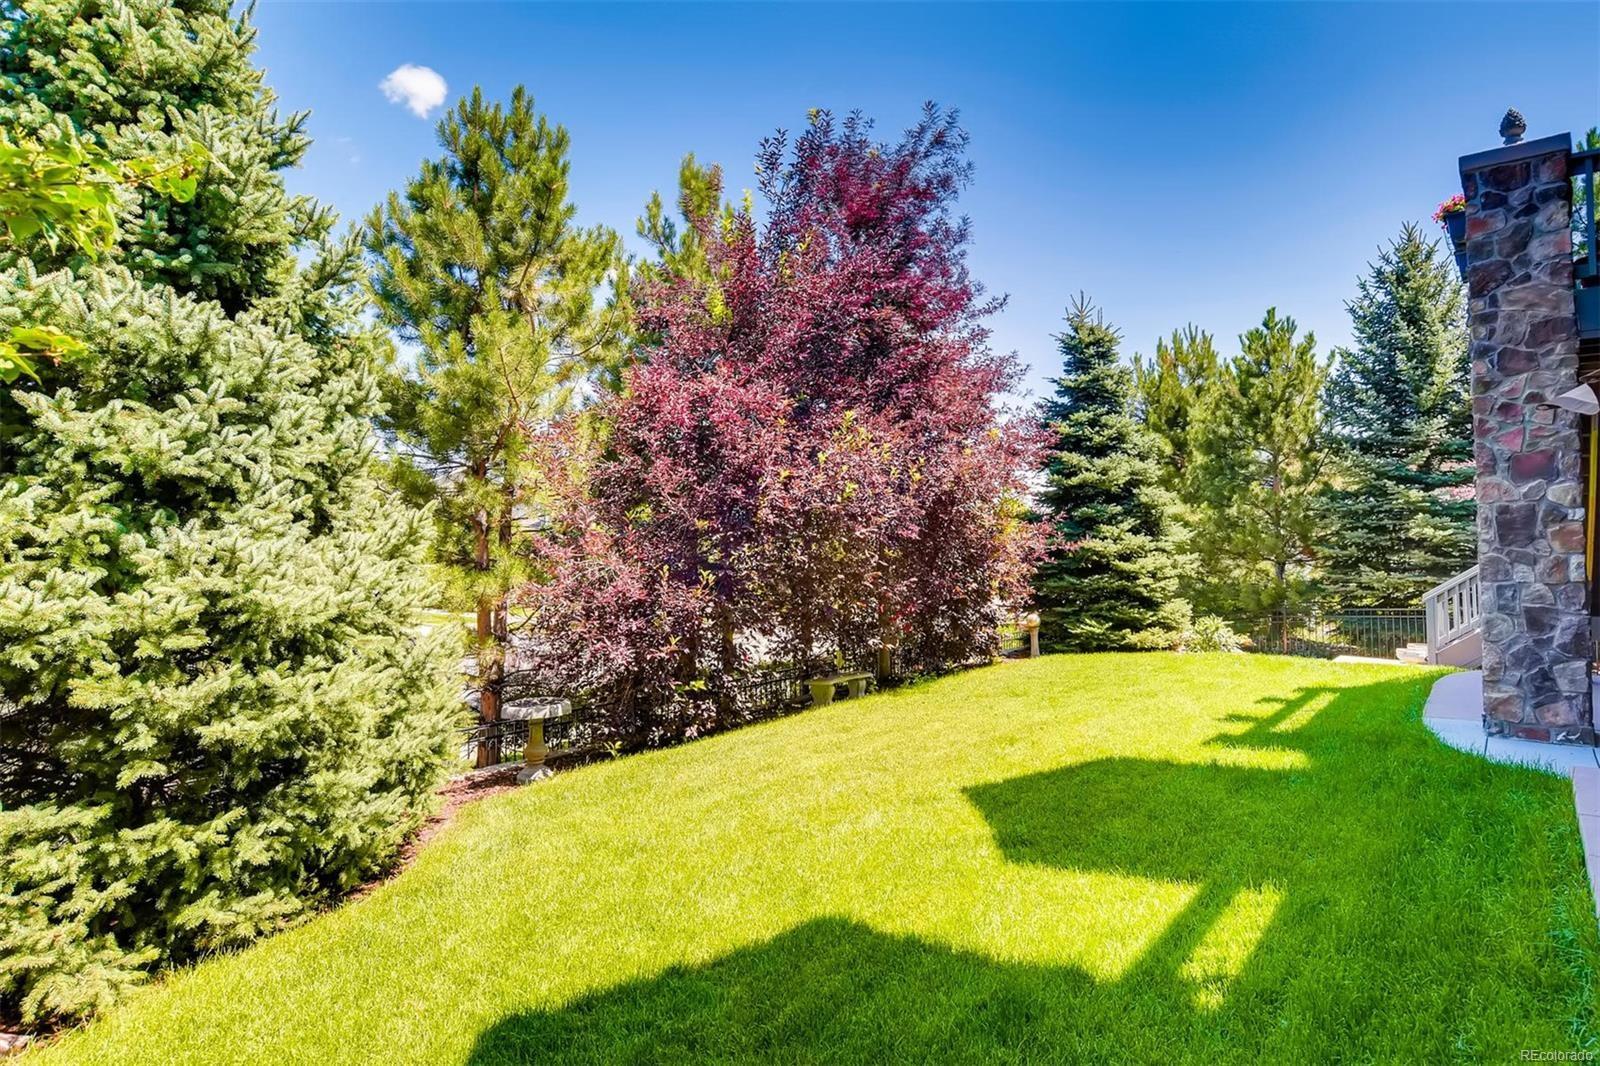 MLS# 4553007 - 15 - 9085 Blufftop Way, Lone Tree, CO 80124